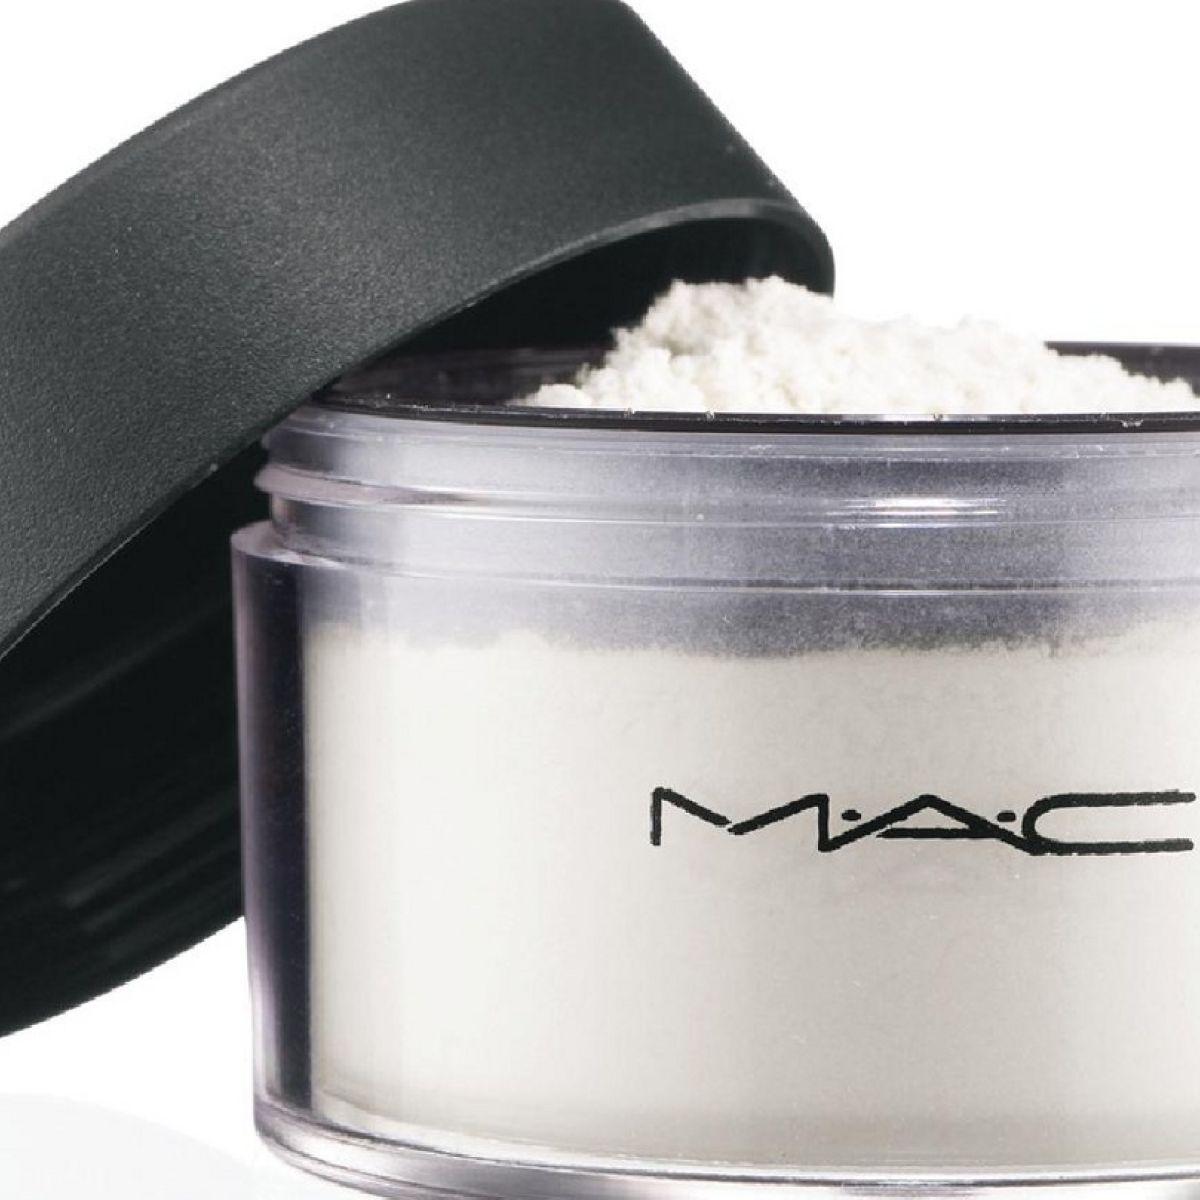 MAC Professional Cosmetics: Bestsellers and Short Description 50